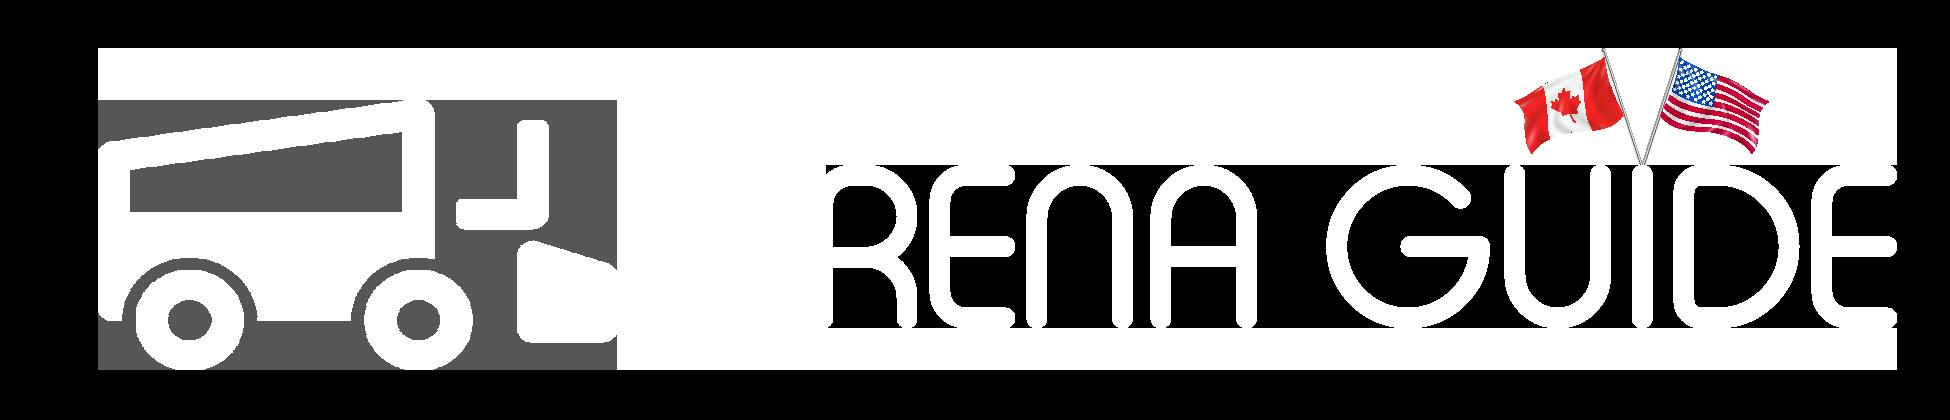 Arena Guide